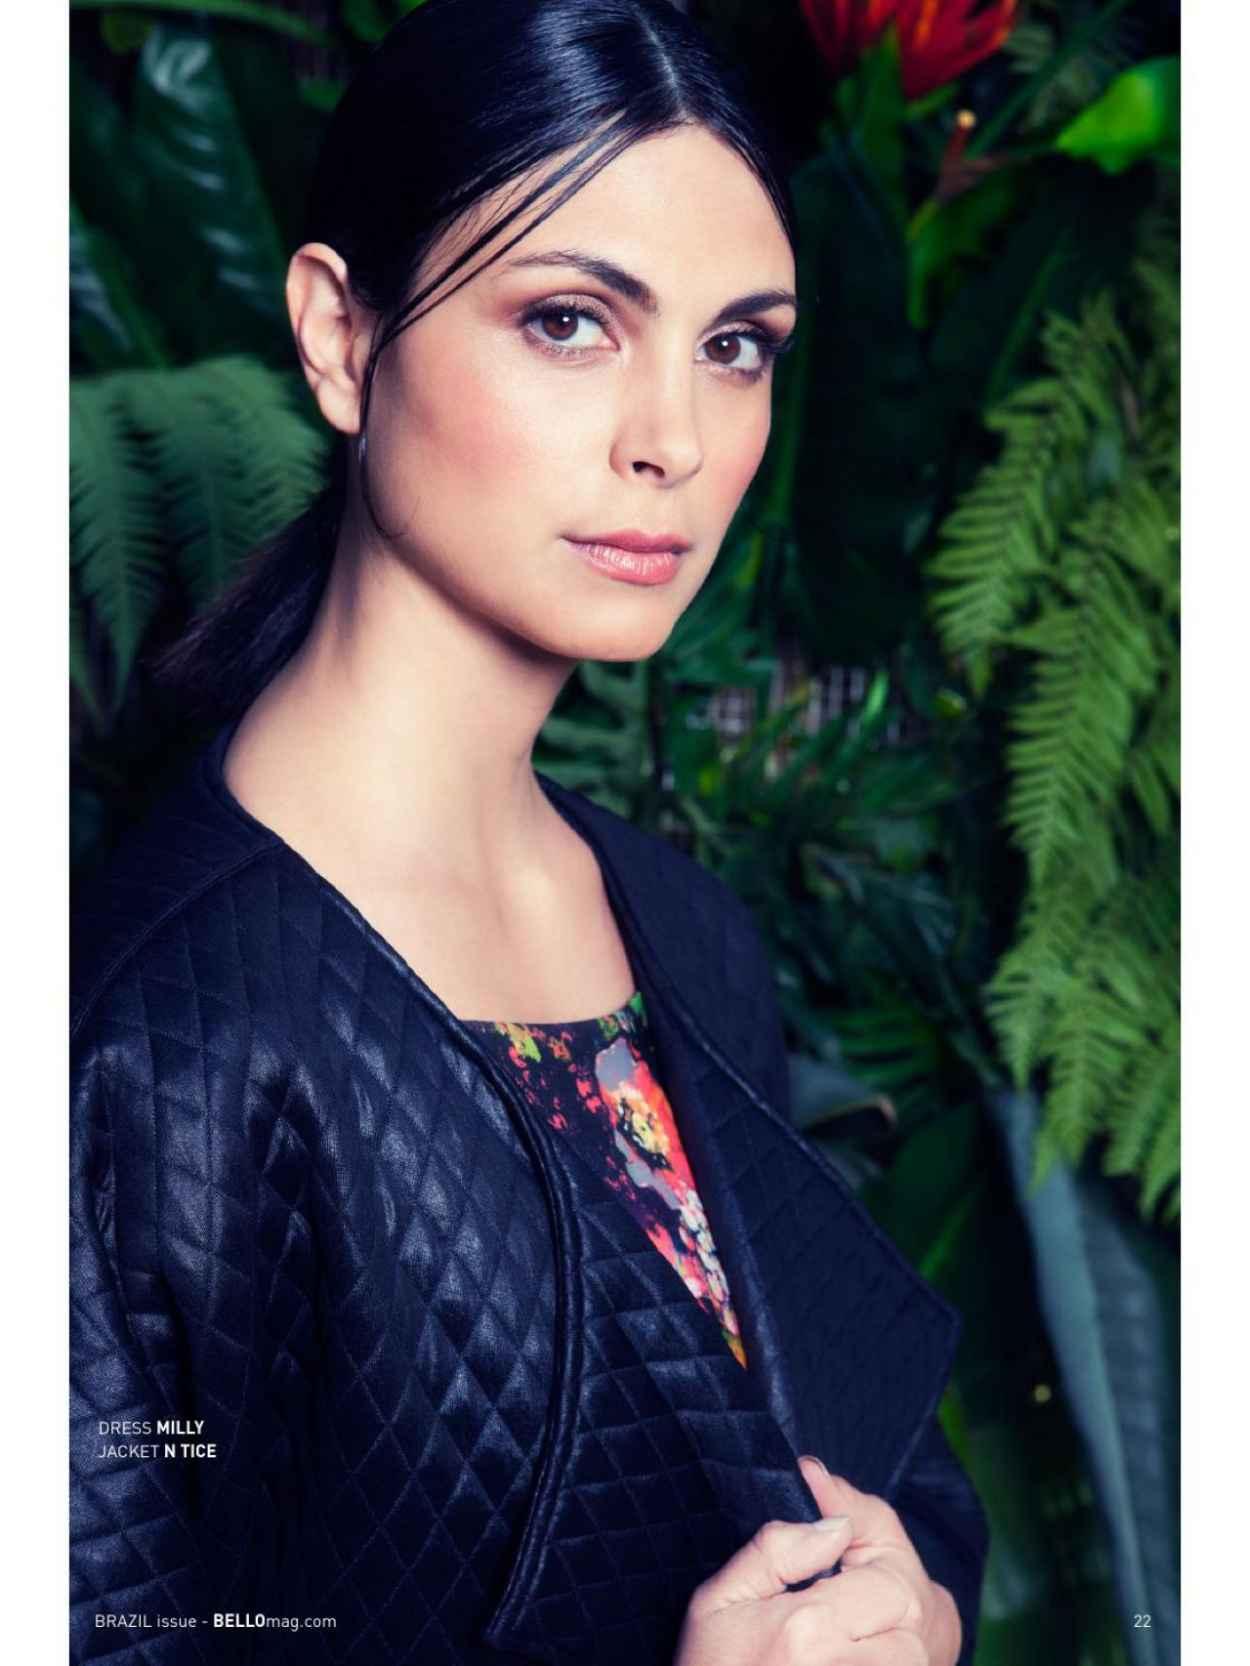 Morena Baccarin - BELLO Magazine - July 2015 Issue-1